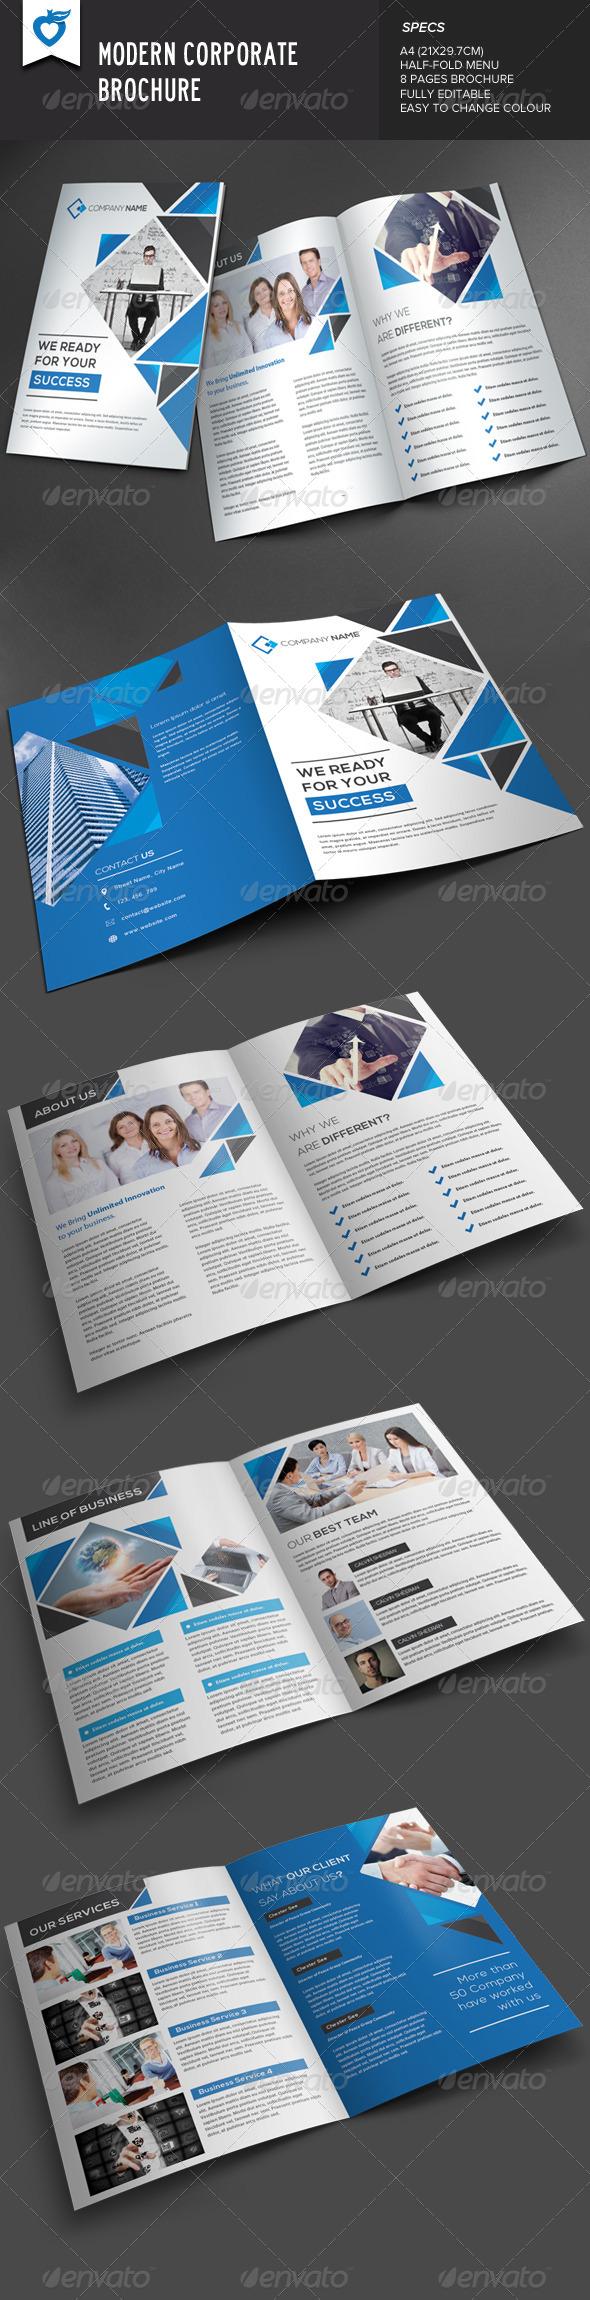 GraphicRiver Modern Corporate Brochure v2 8091790